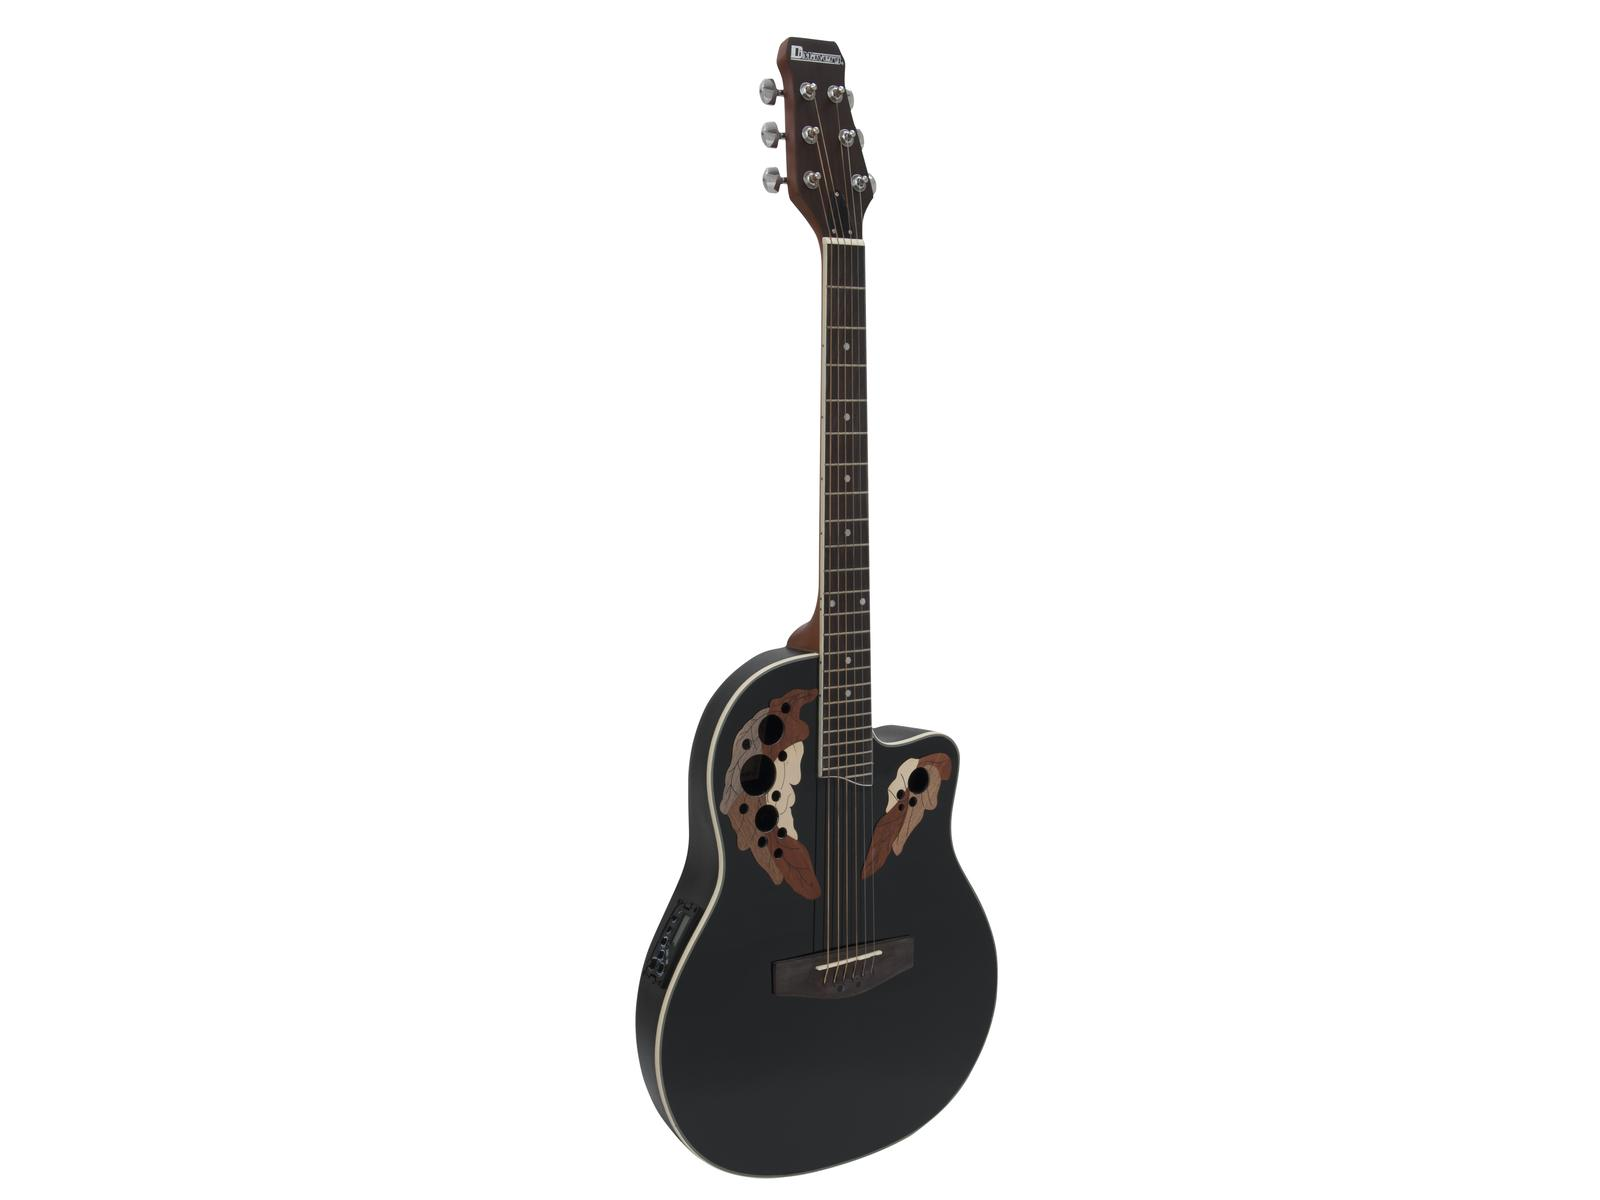 Fotografie Dimavery OV-500 elektro-akustická kytara Ovation, černá